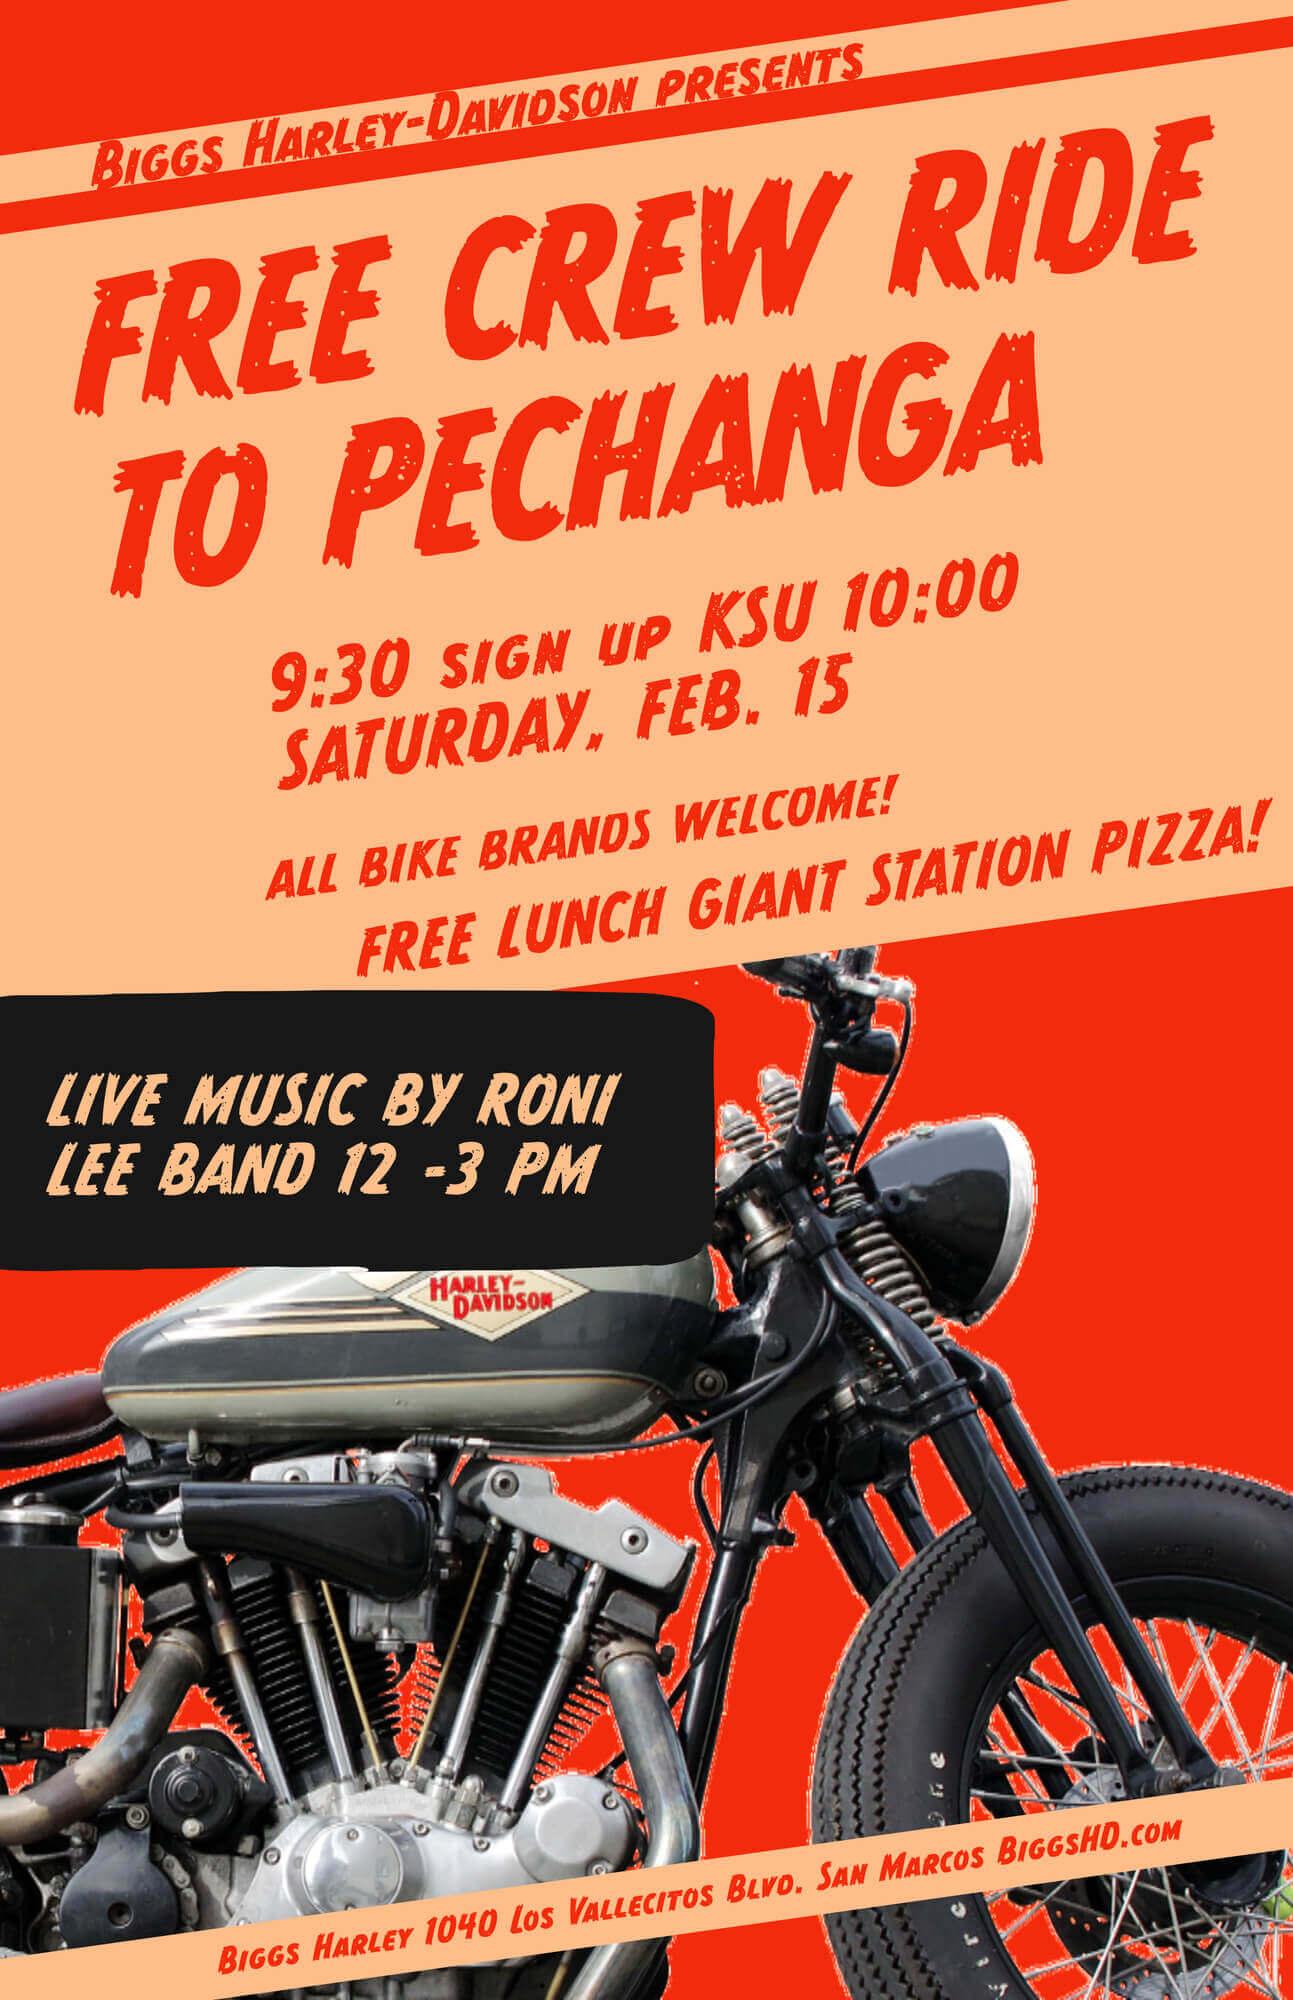 Biggs Harley Free Crew Ride To Pechanga